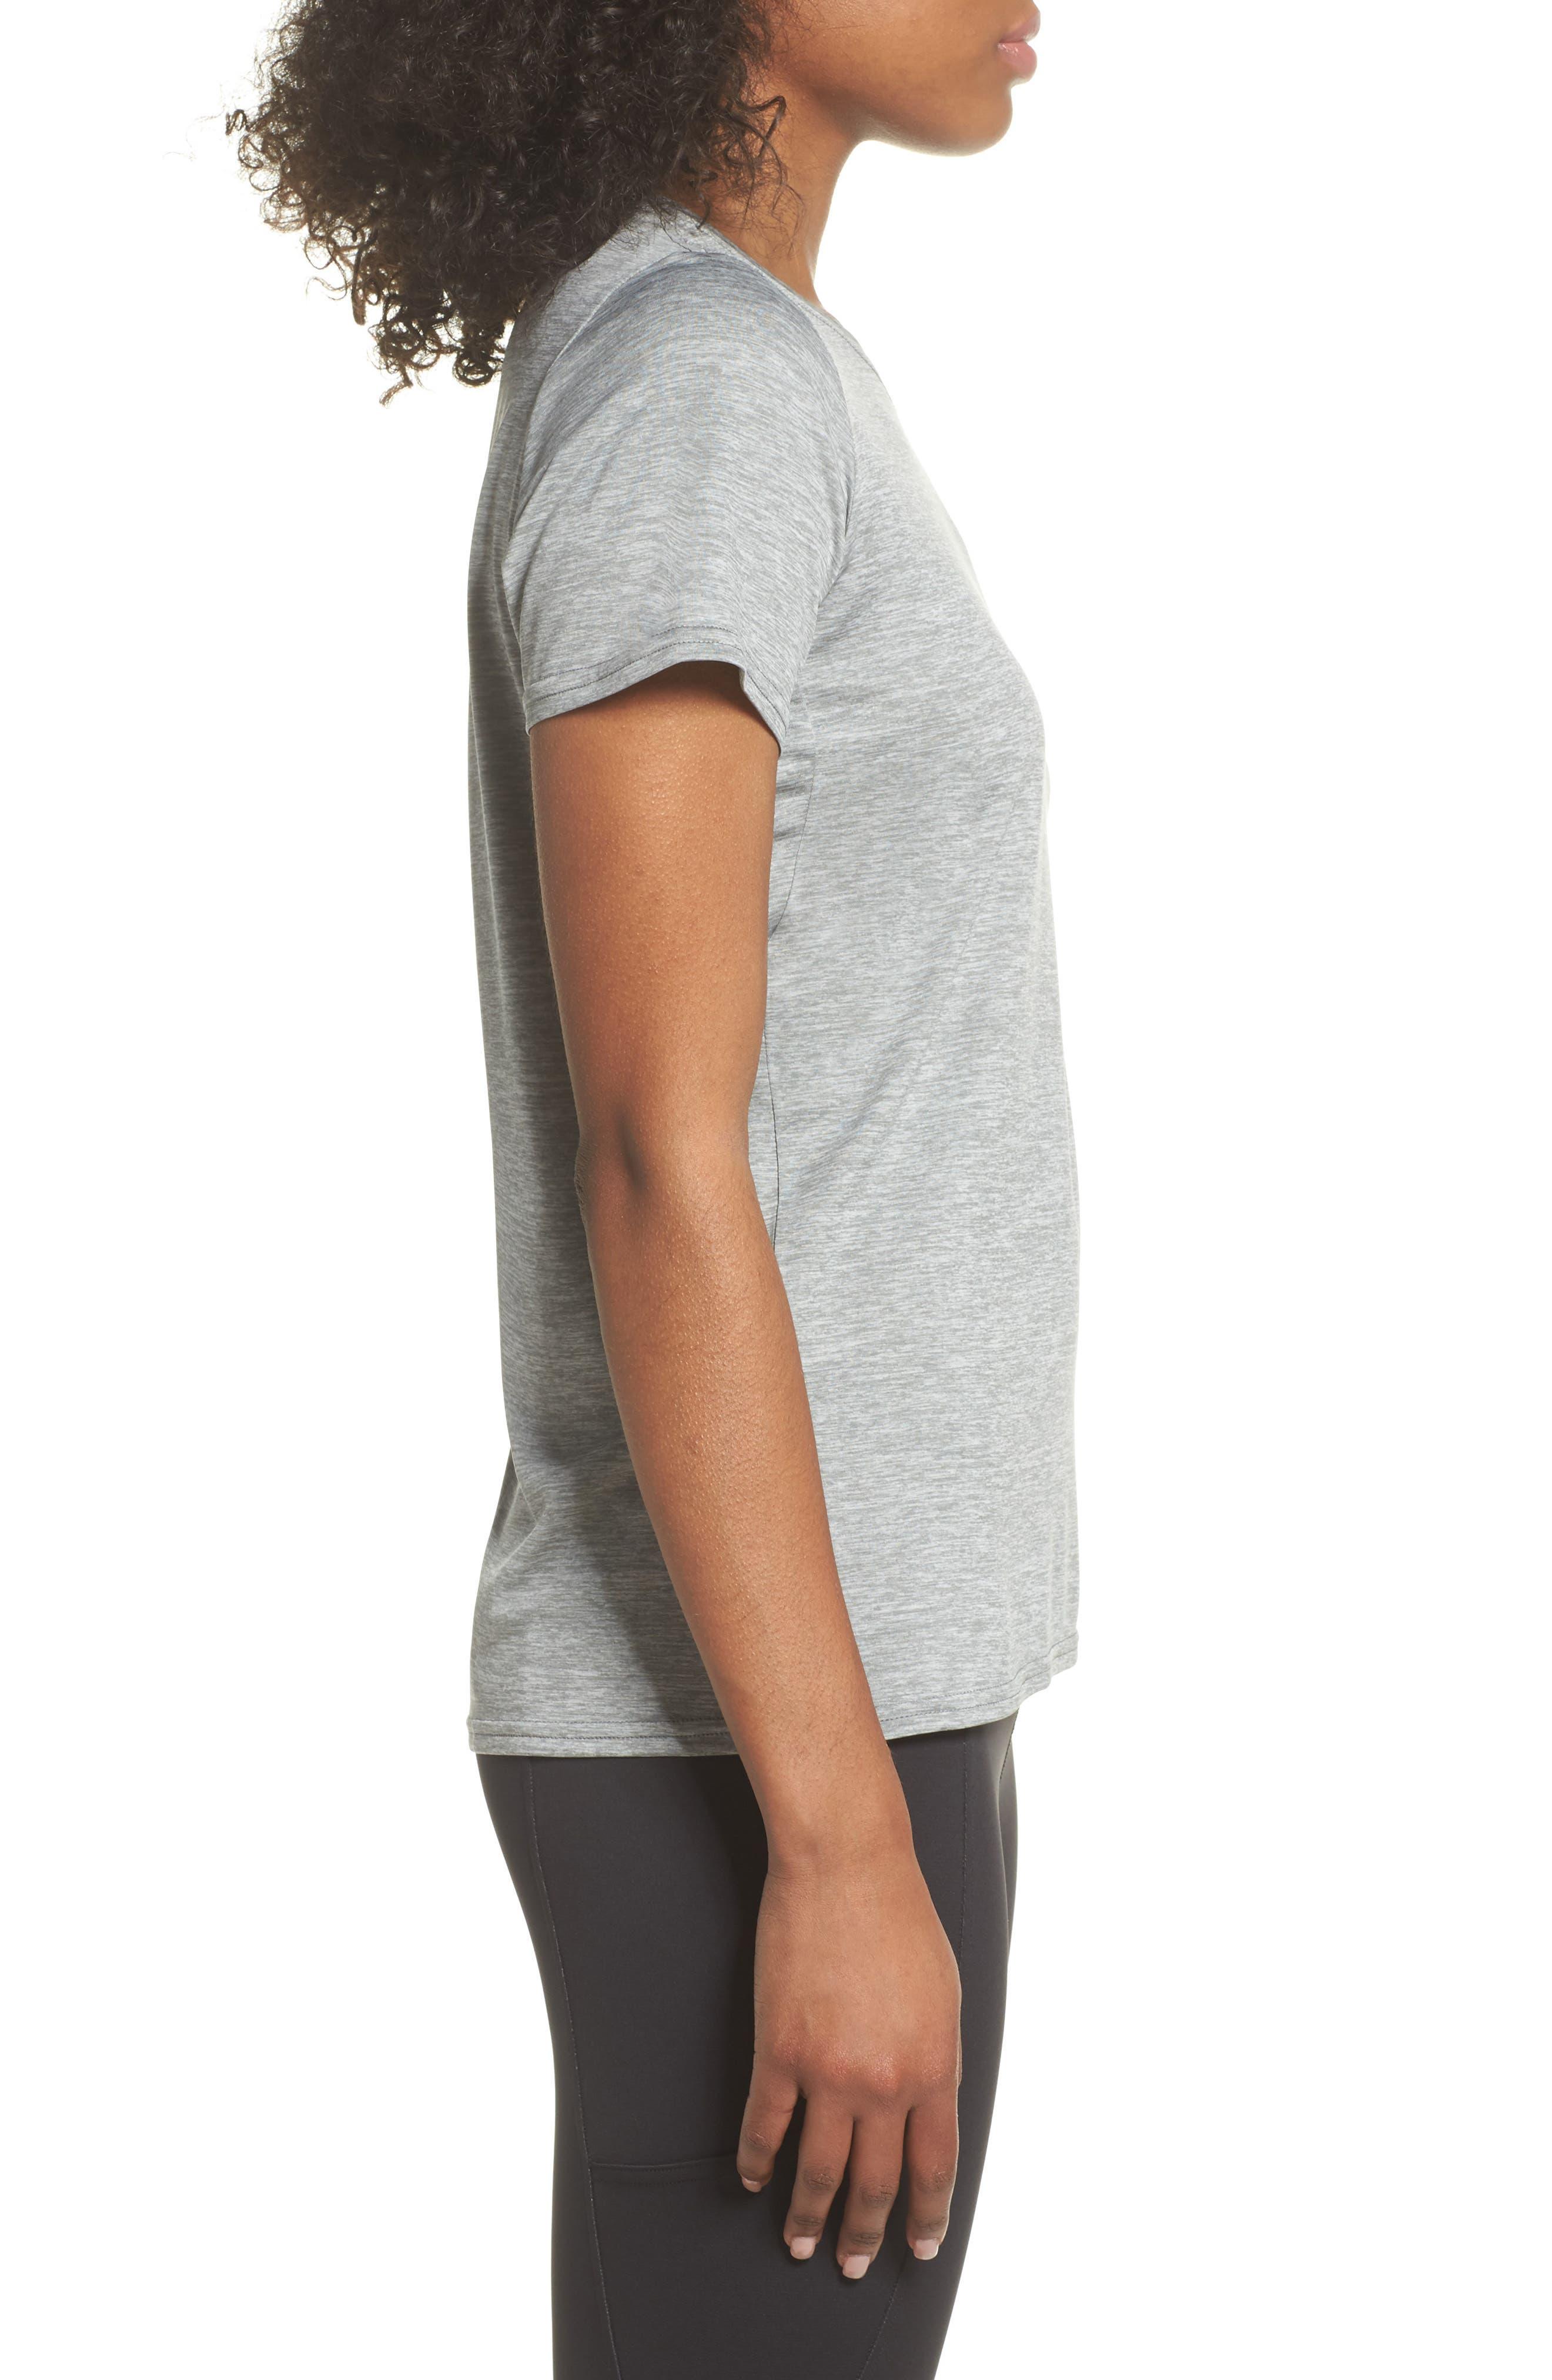 Capilene<sup>®</sup> Dailty T-Shirt,                             Alternate thumbnail 3, color,                             Feather Grey